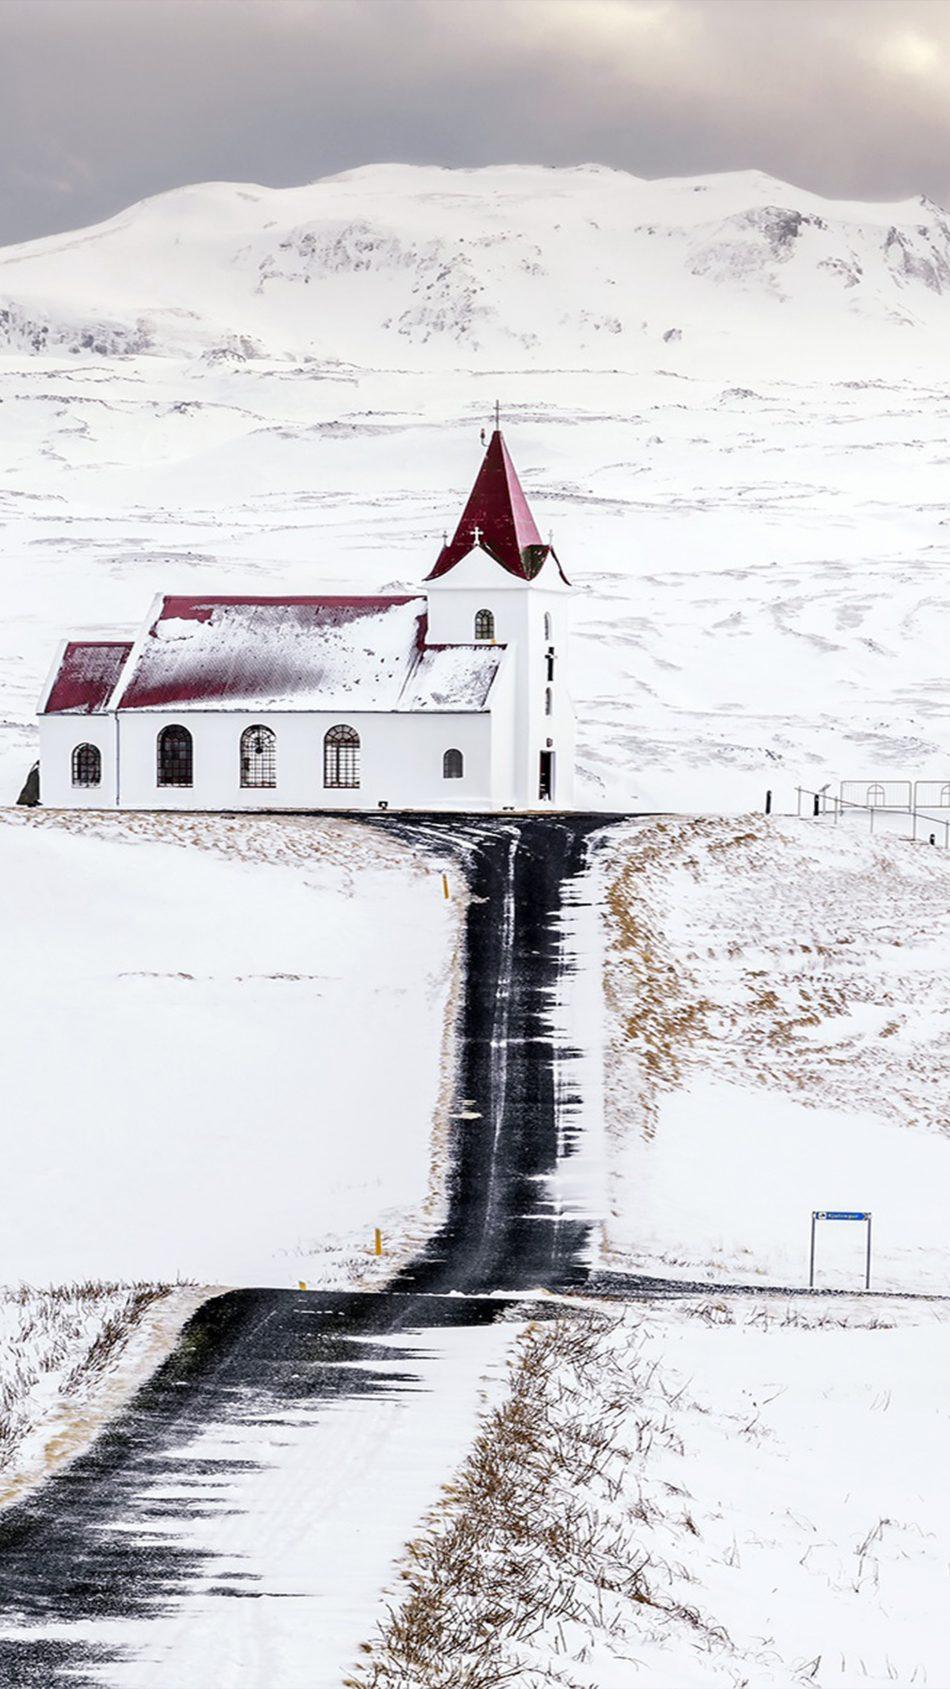 Church Snow Landscape 4K Ultra HD Mobile Wallpaper